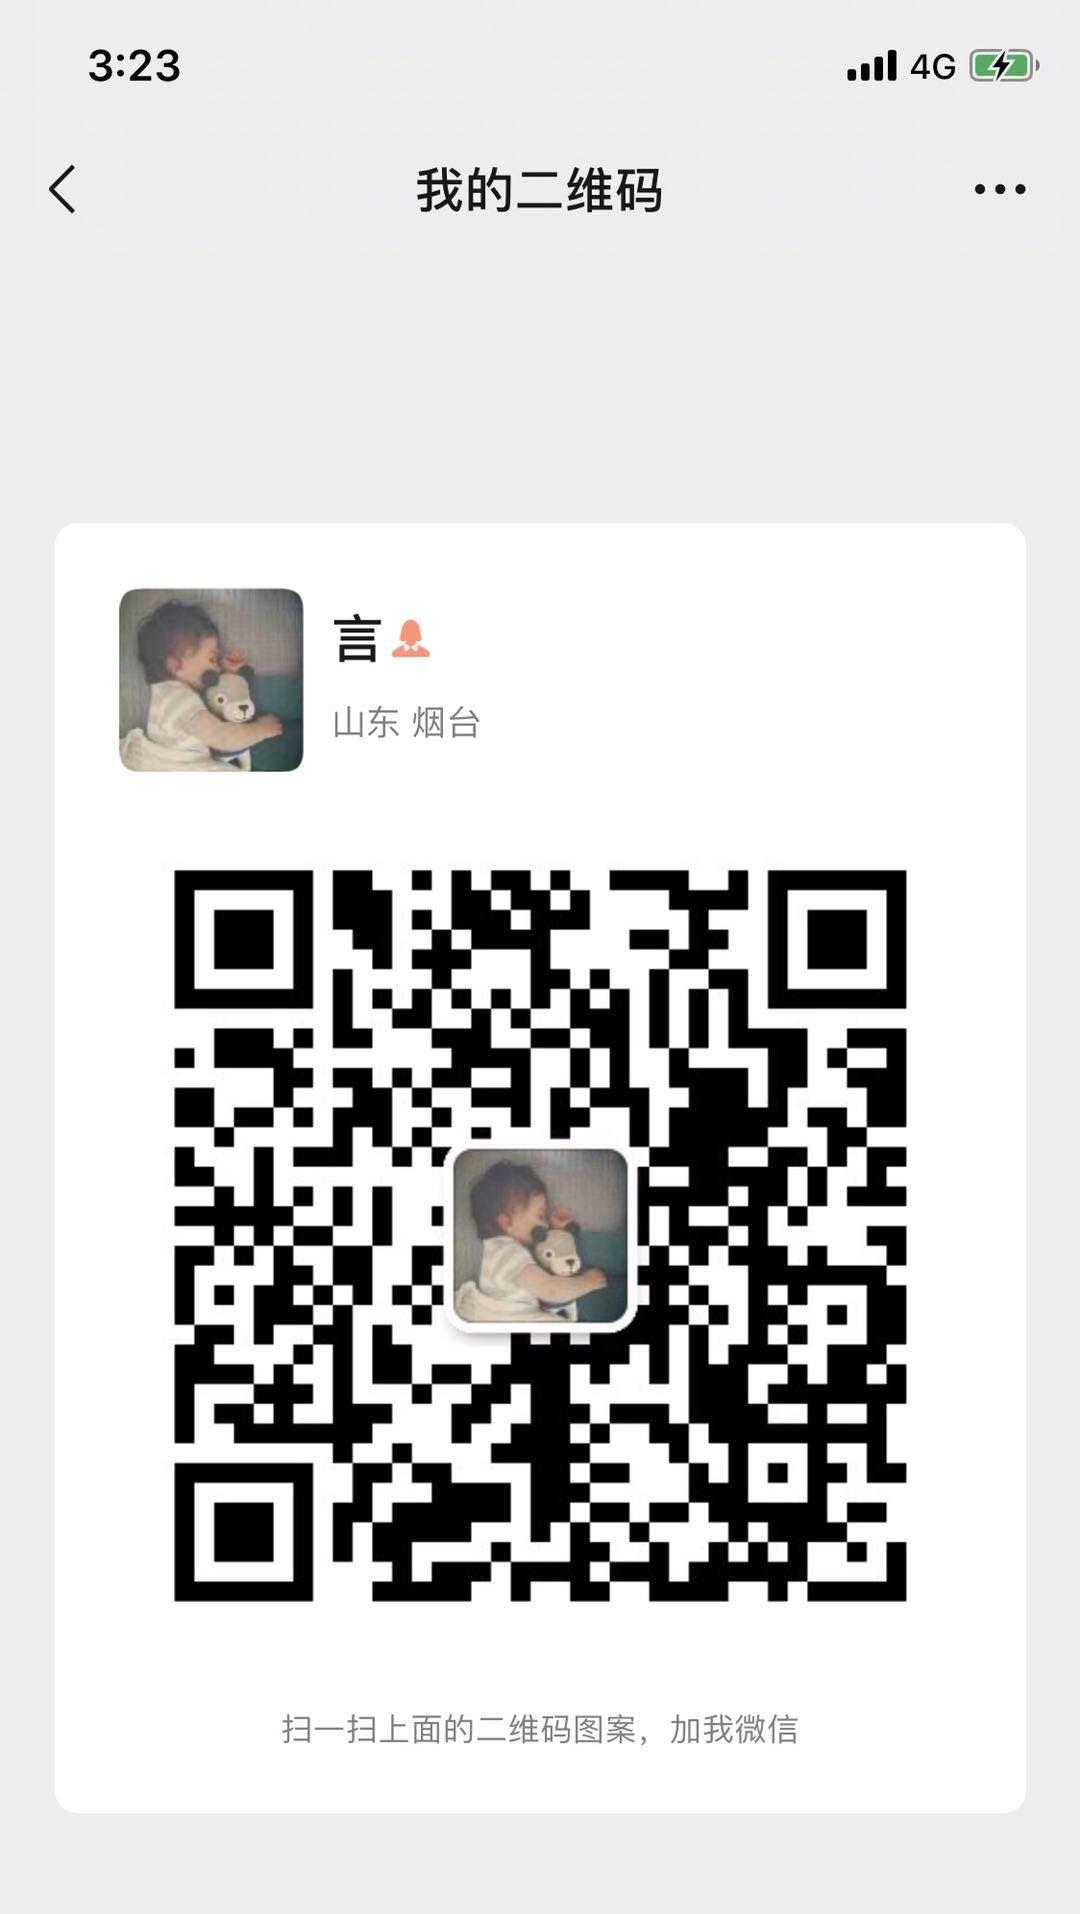 20200406/59014055f6dc7d3c9f4061e86b72eb0d.jpg